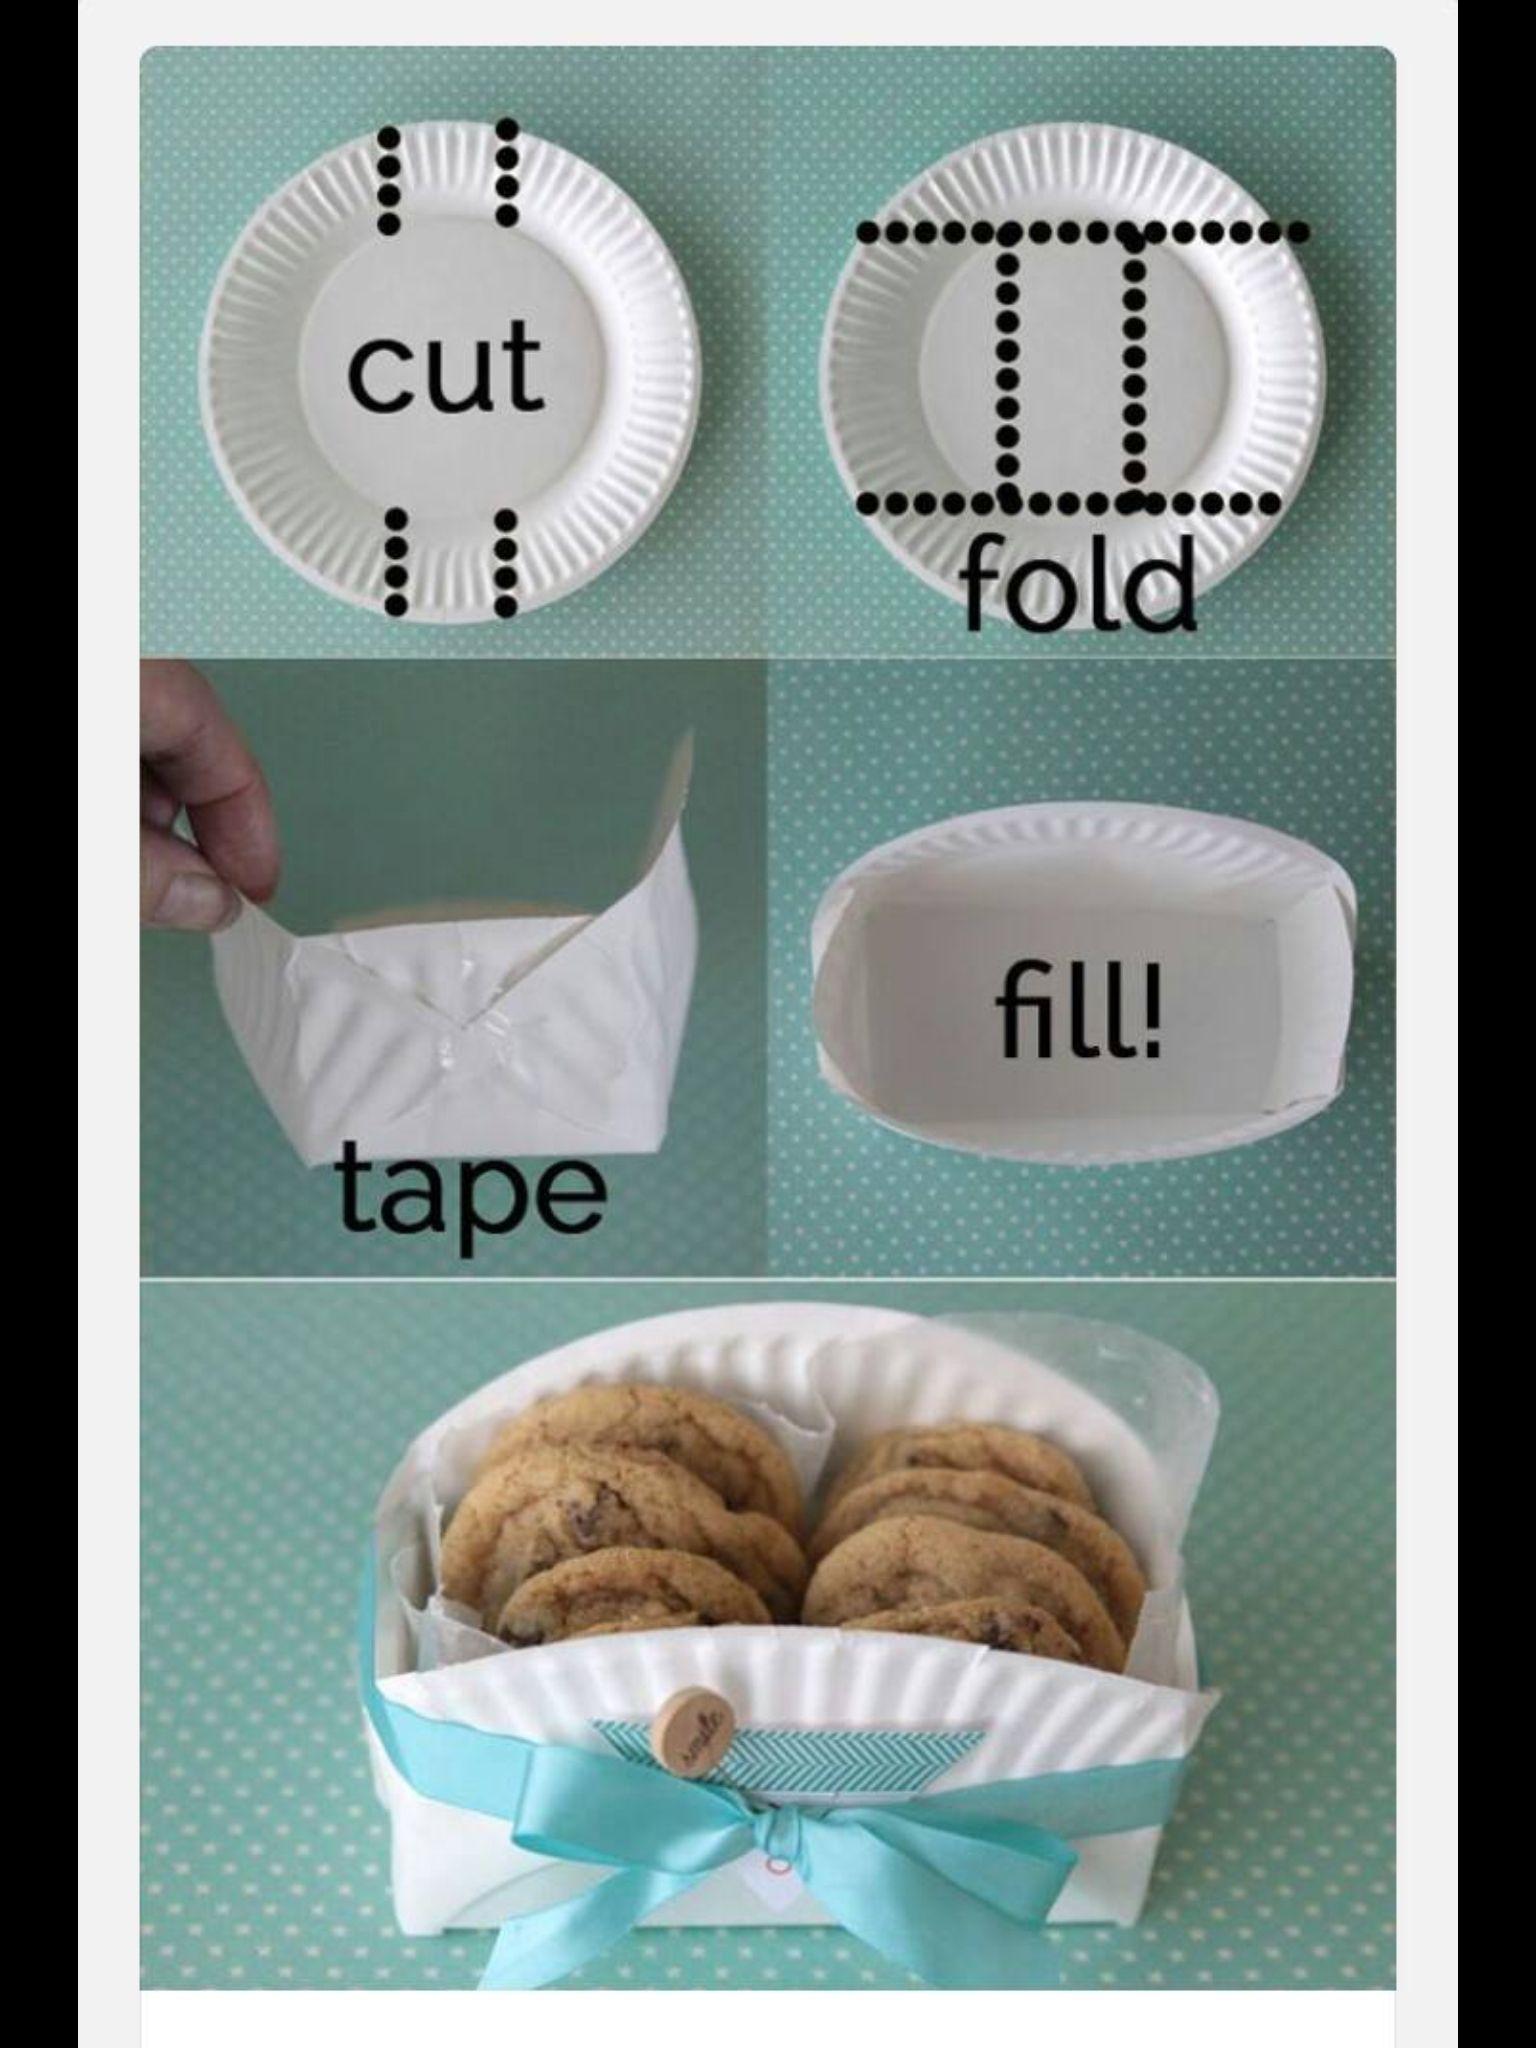 Cut fold tape fill ~ transform a paper plate into a container! & Cut fold tape fill ~ transform a paper plate into a container ...